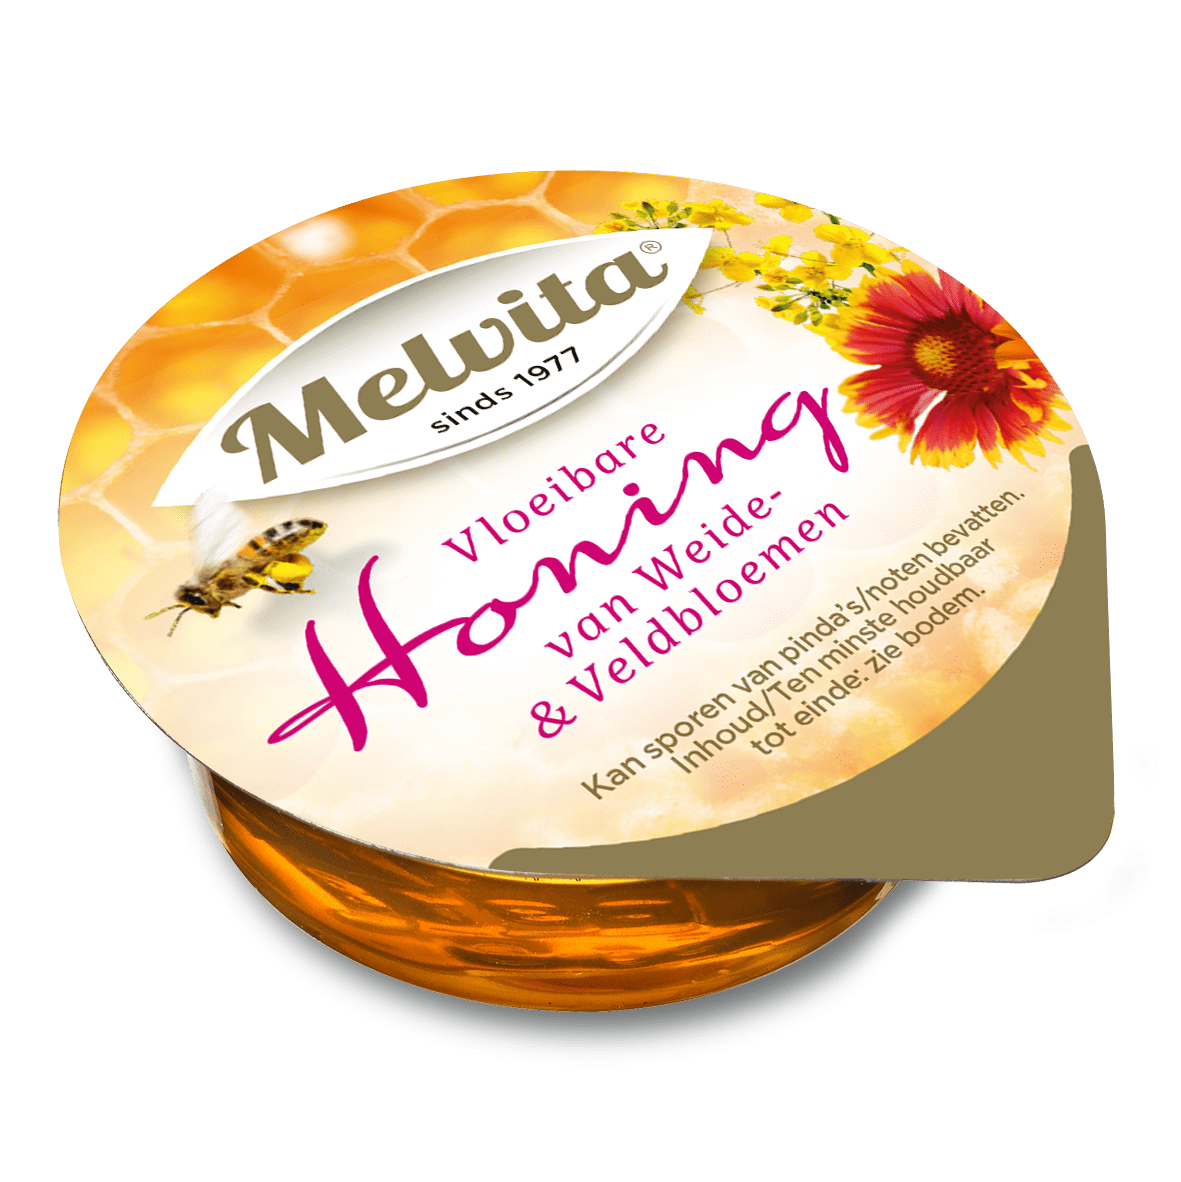 Van Oordt | Honing | 240 cups